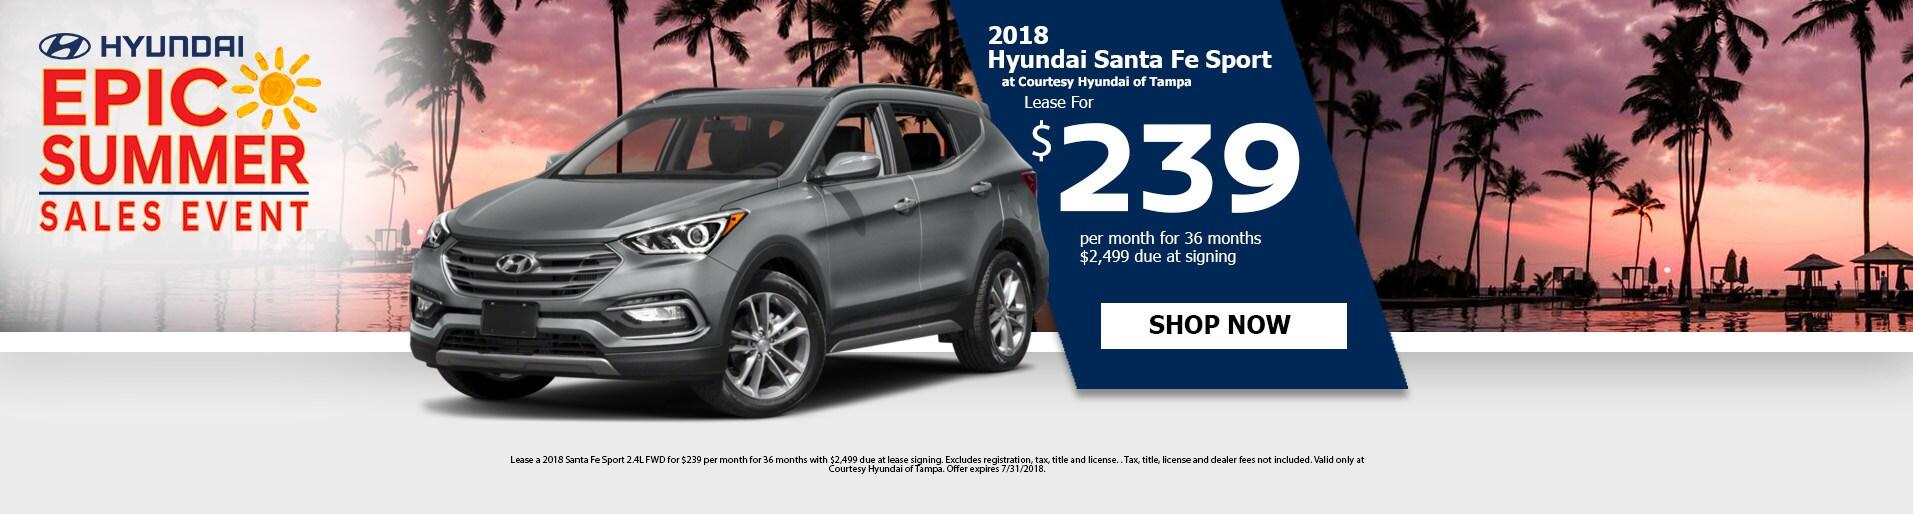 Hyundai Dealer Near Me | Hyundai Tampa ndon & New Port Richey